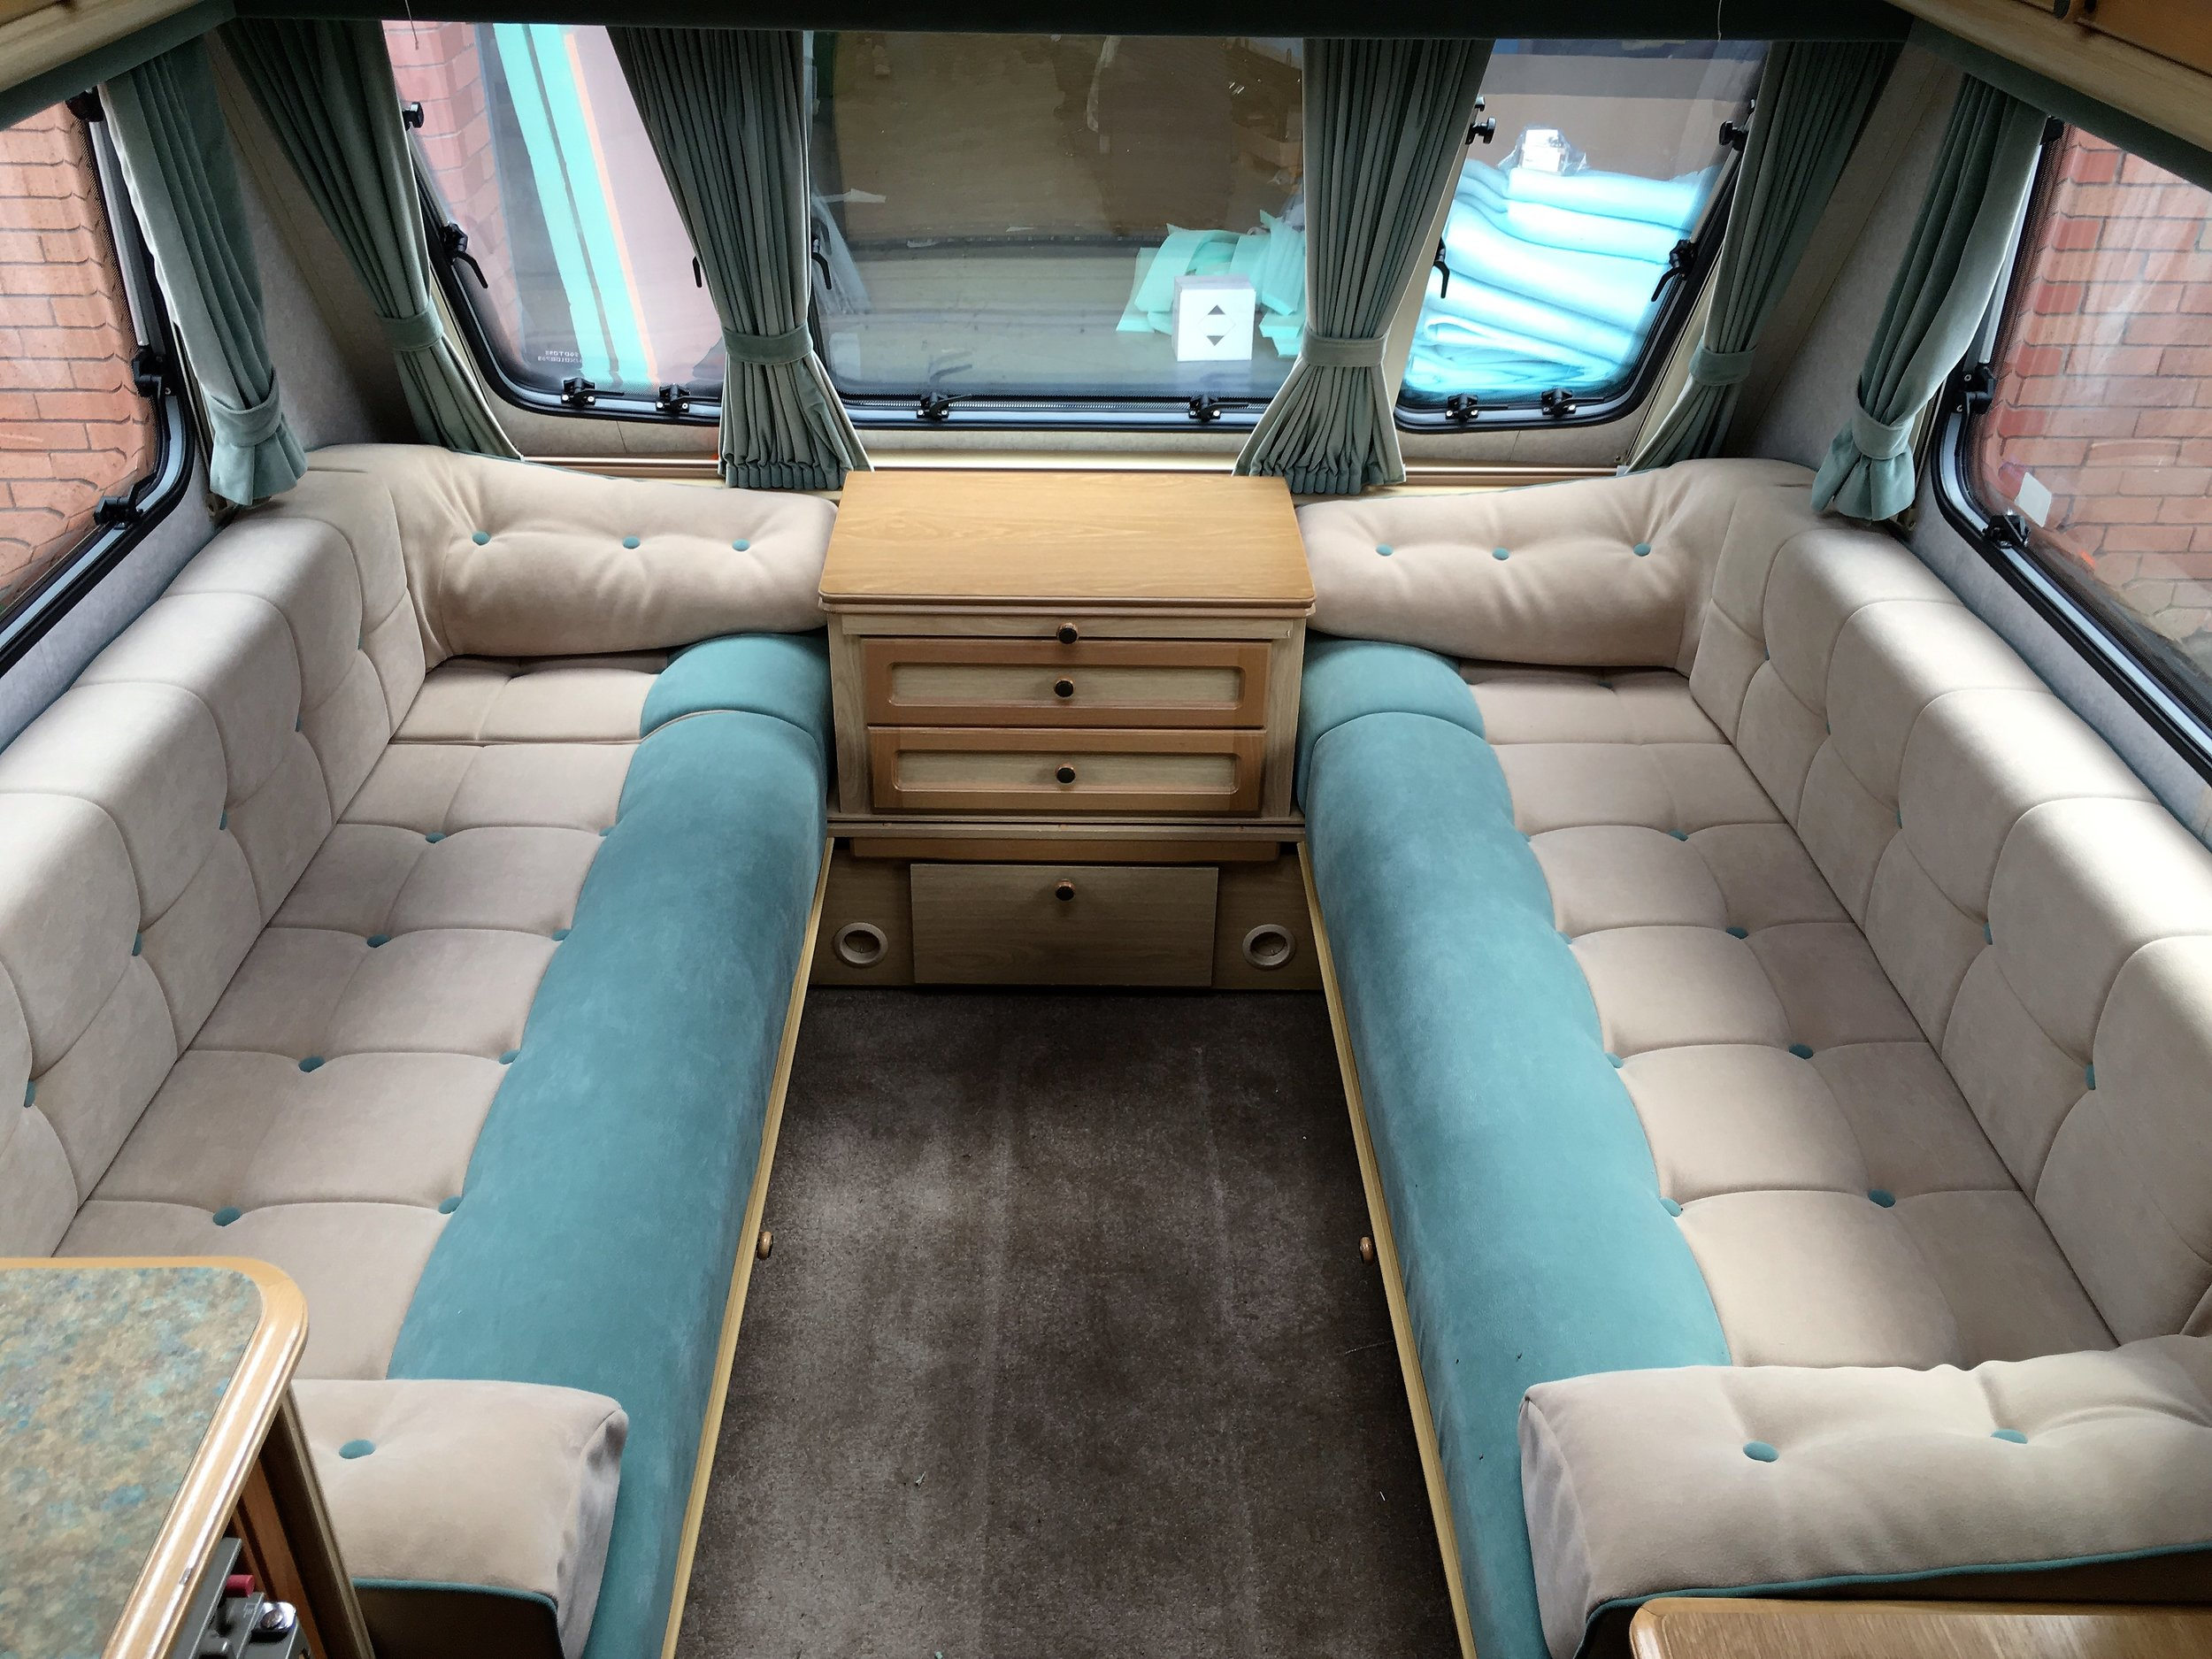 Vision Leisure Upholstery_027.JPG